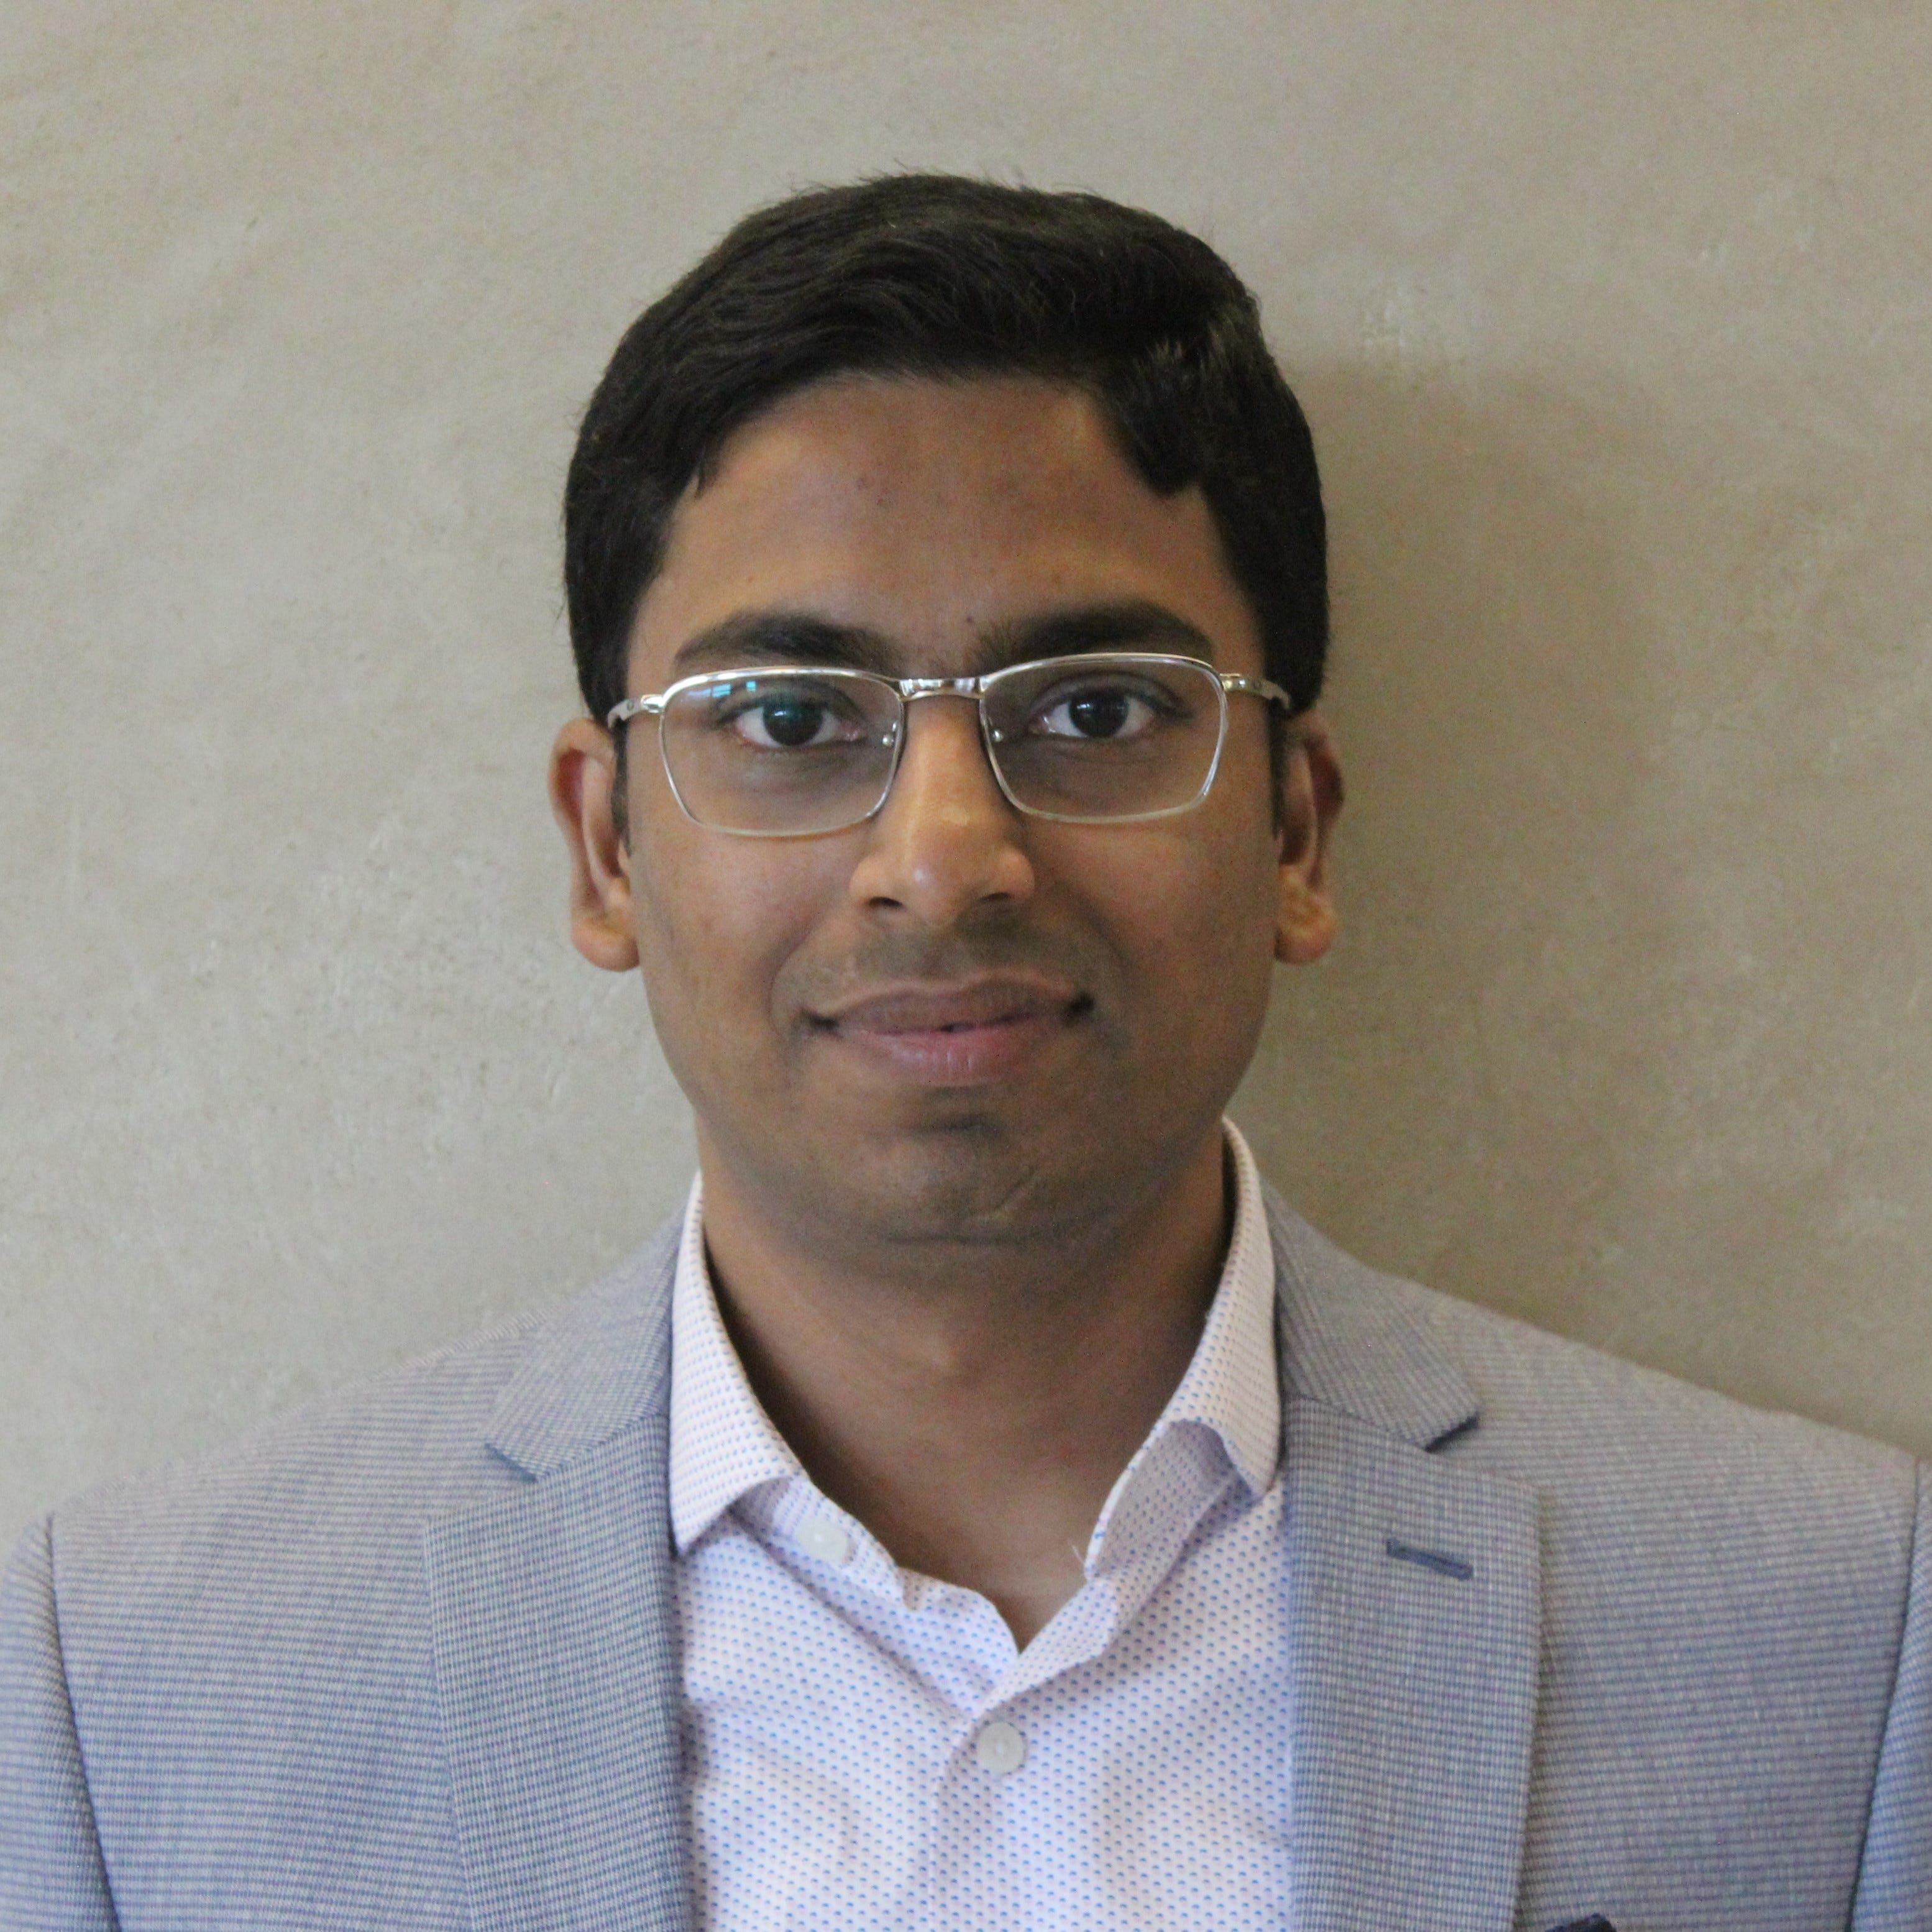 Heartbeats: Joslin Diabetes Center welcomes Sulay H. Shah, M.D.